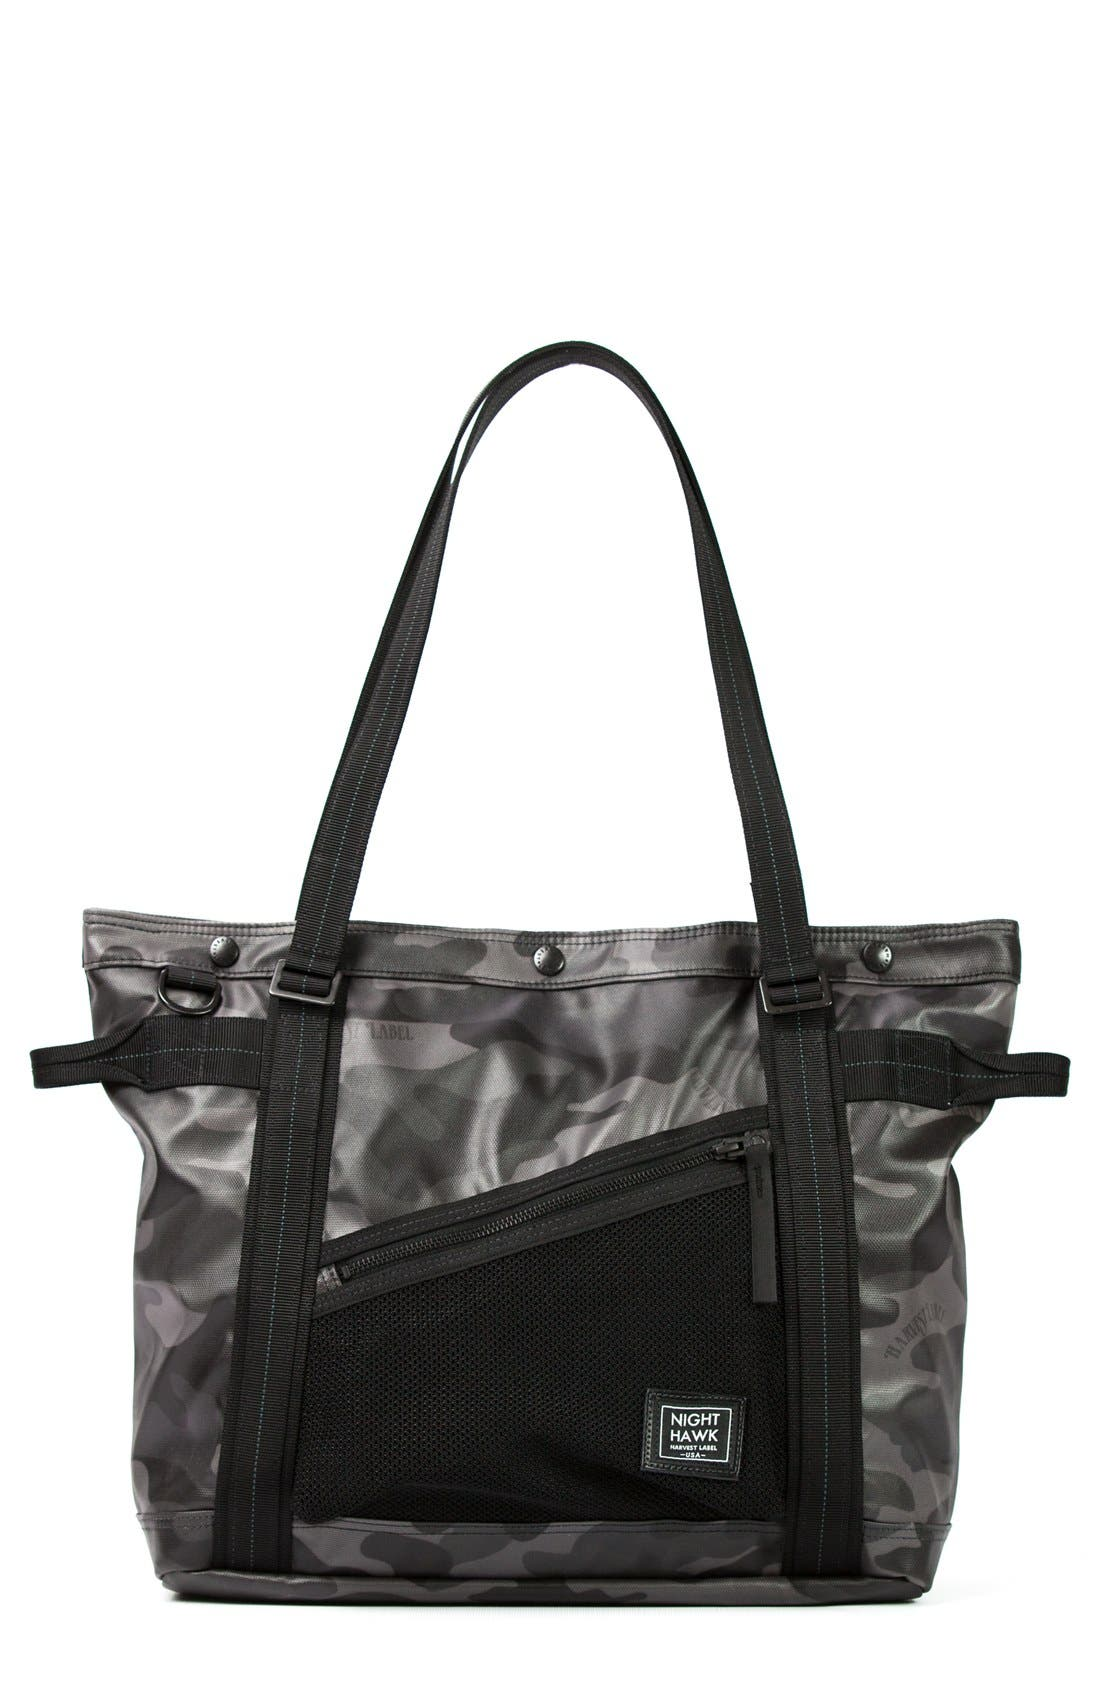 Alternate Image 1 Selected - Harvest Label 'NightHawk' Tote Bag